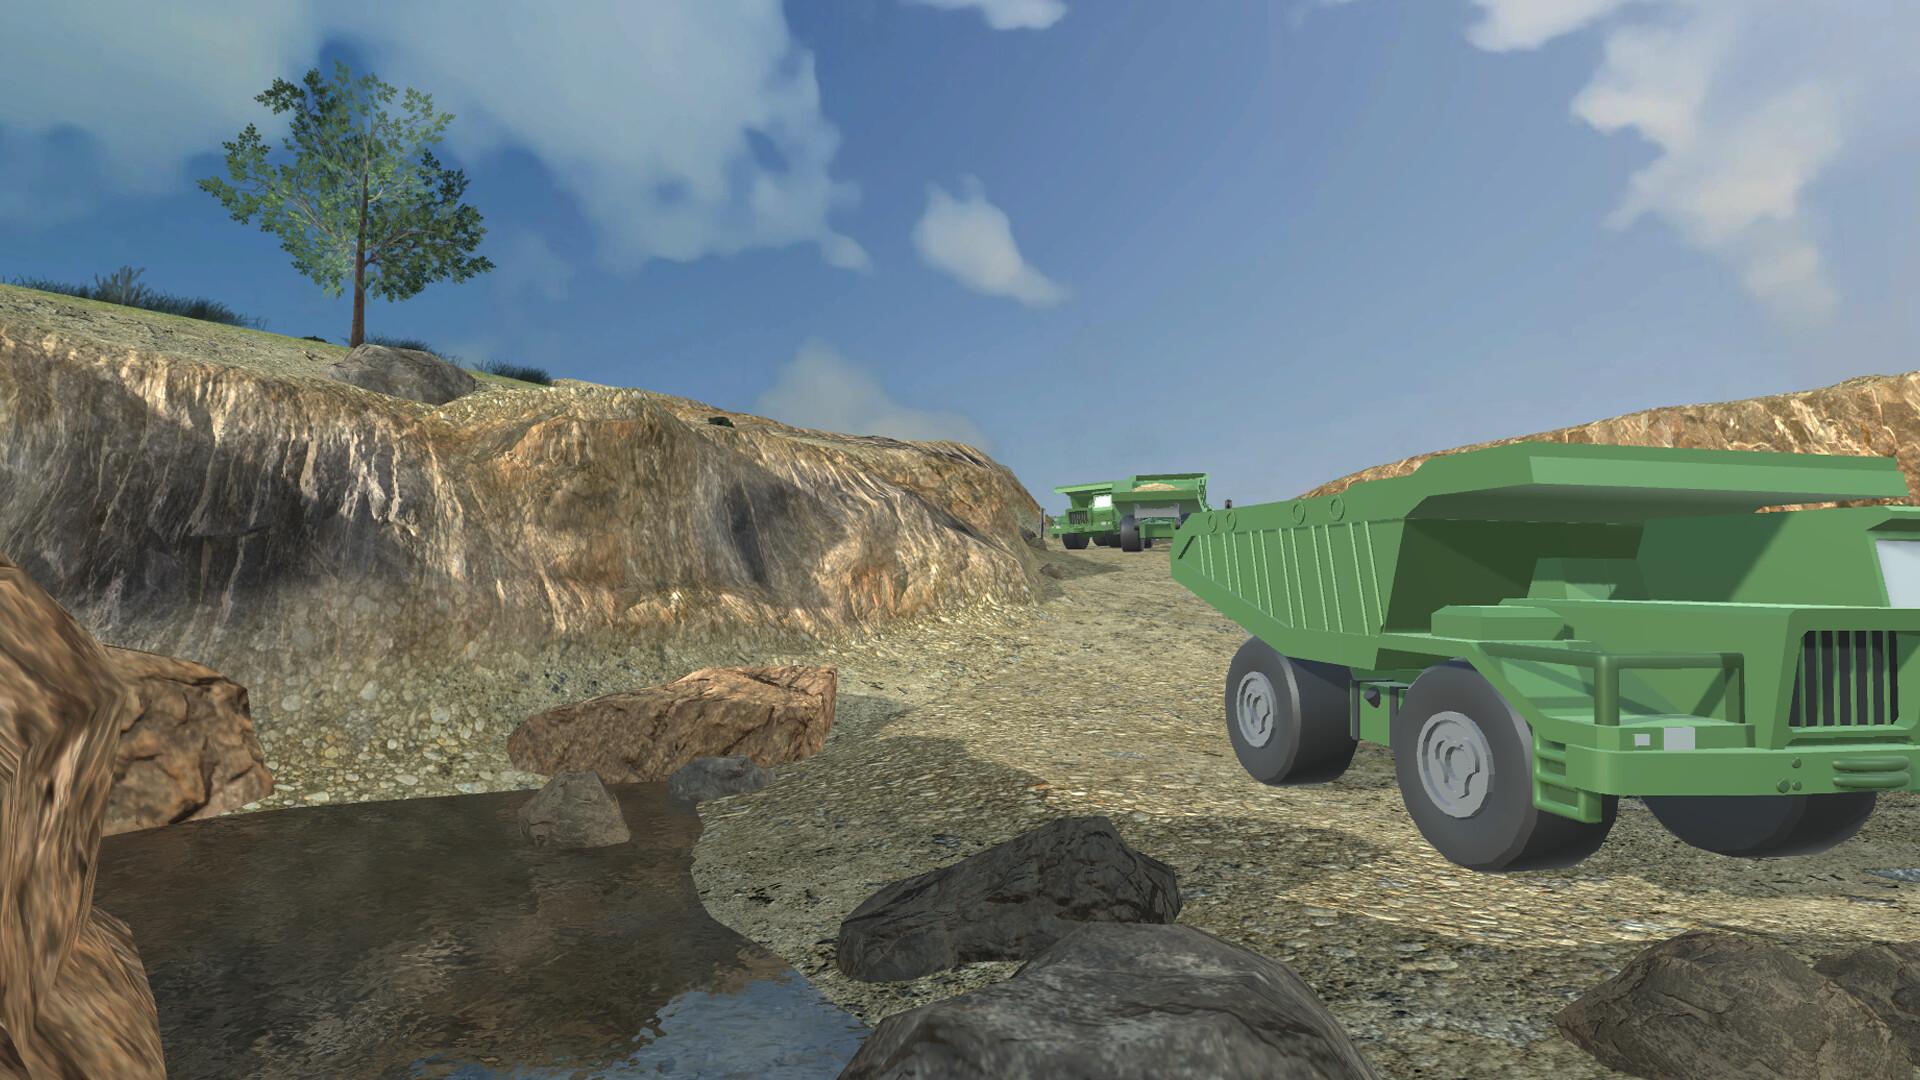 Jordan cameron quarry 15